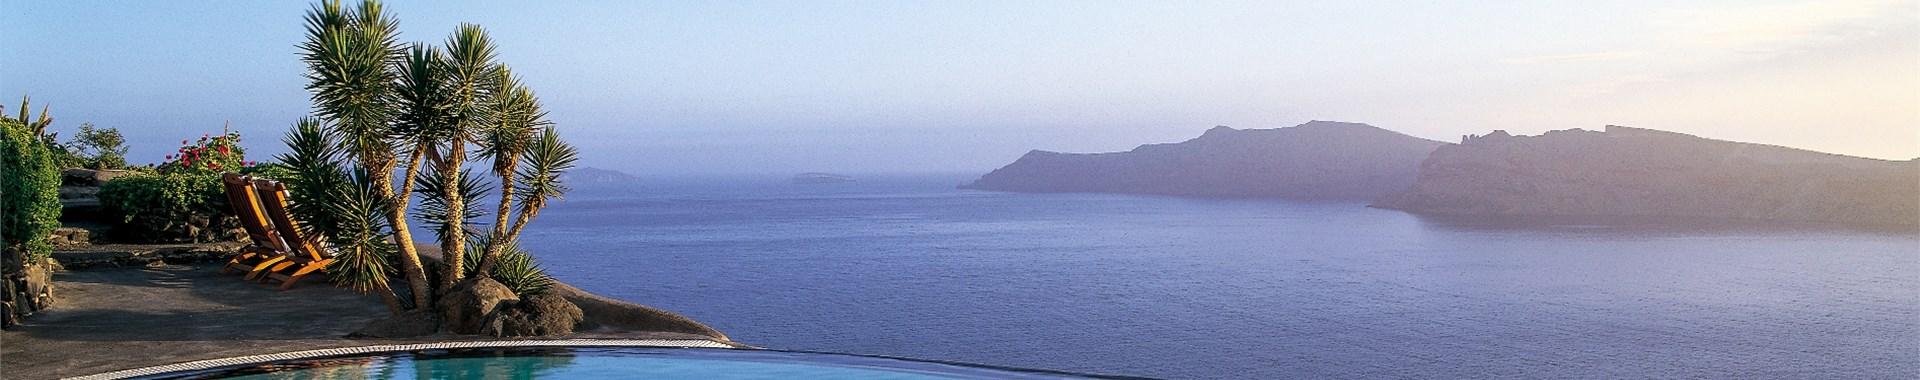 Santorini 5 Star Hotels Online Booking Santorini View